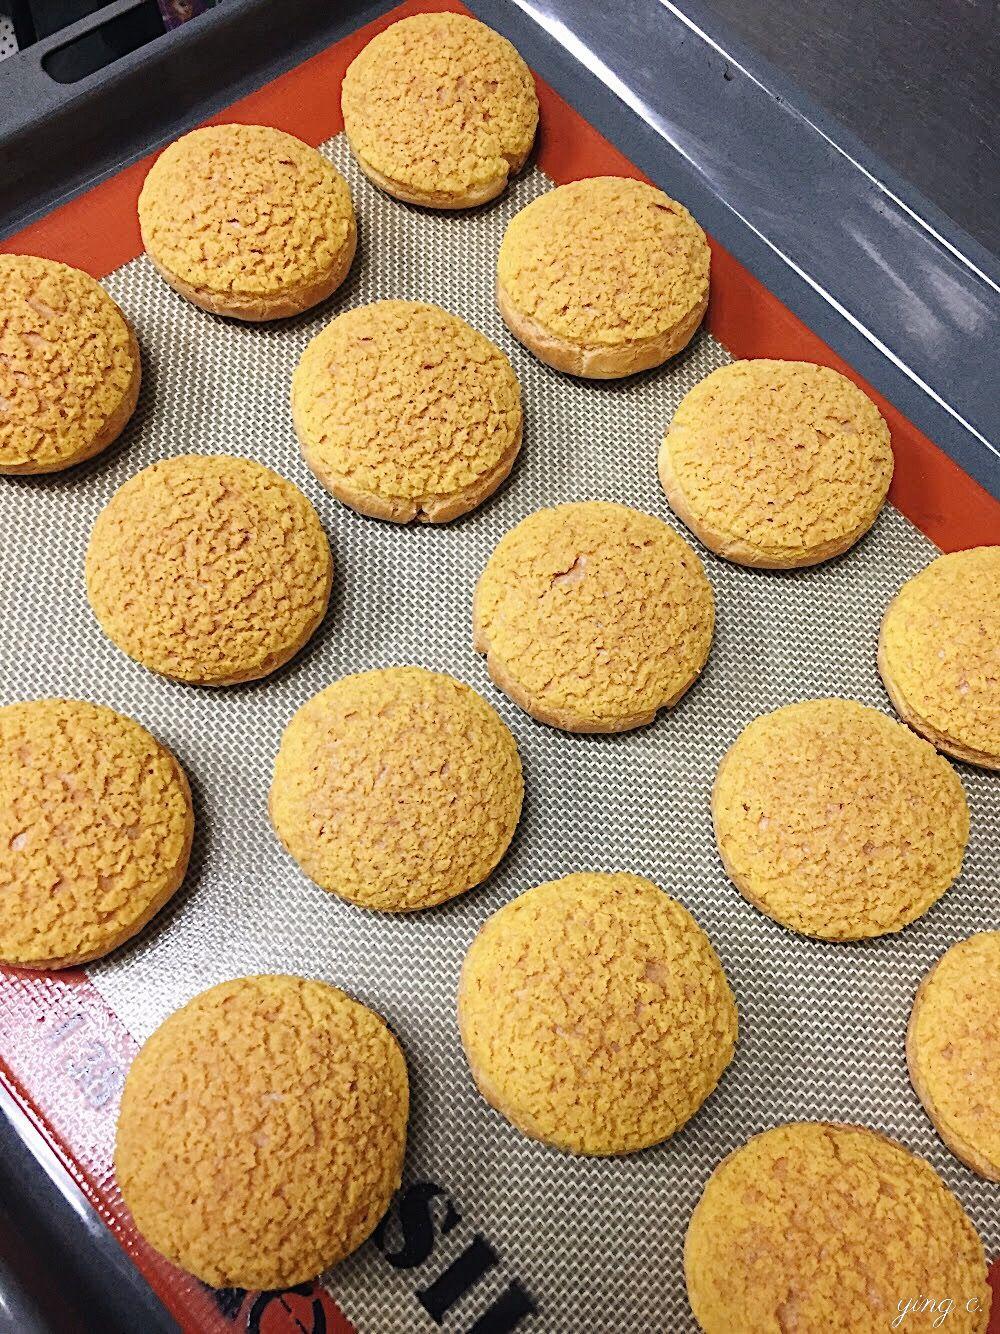 Bonheur Bonne Heure Pâtisserie by Claire L.  製作中的法式泡芙,在頂端加上奶酥,還未填餡與裝飾,才剛剛完成甜點製作的第一步。(攝影:Ying C.)